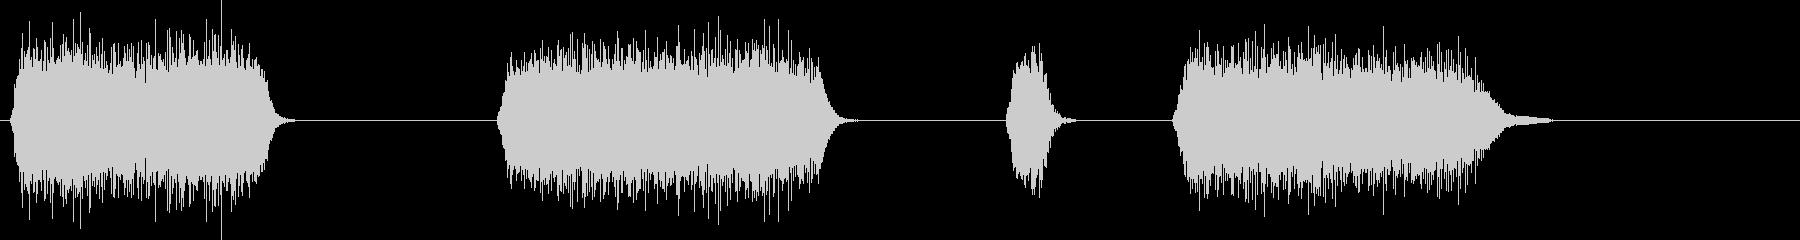 Train Air Horn:Cl...の未再生の波形